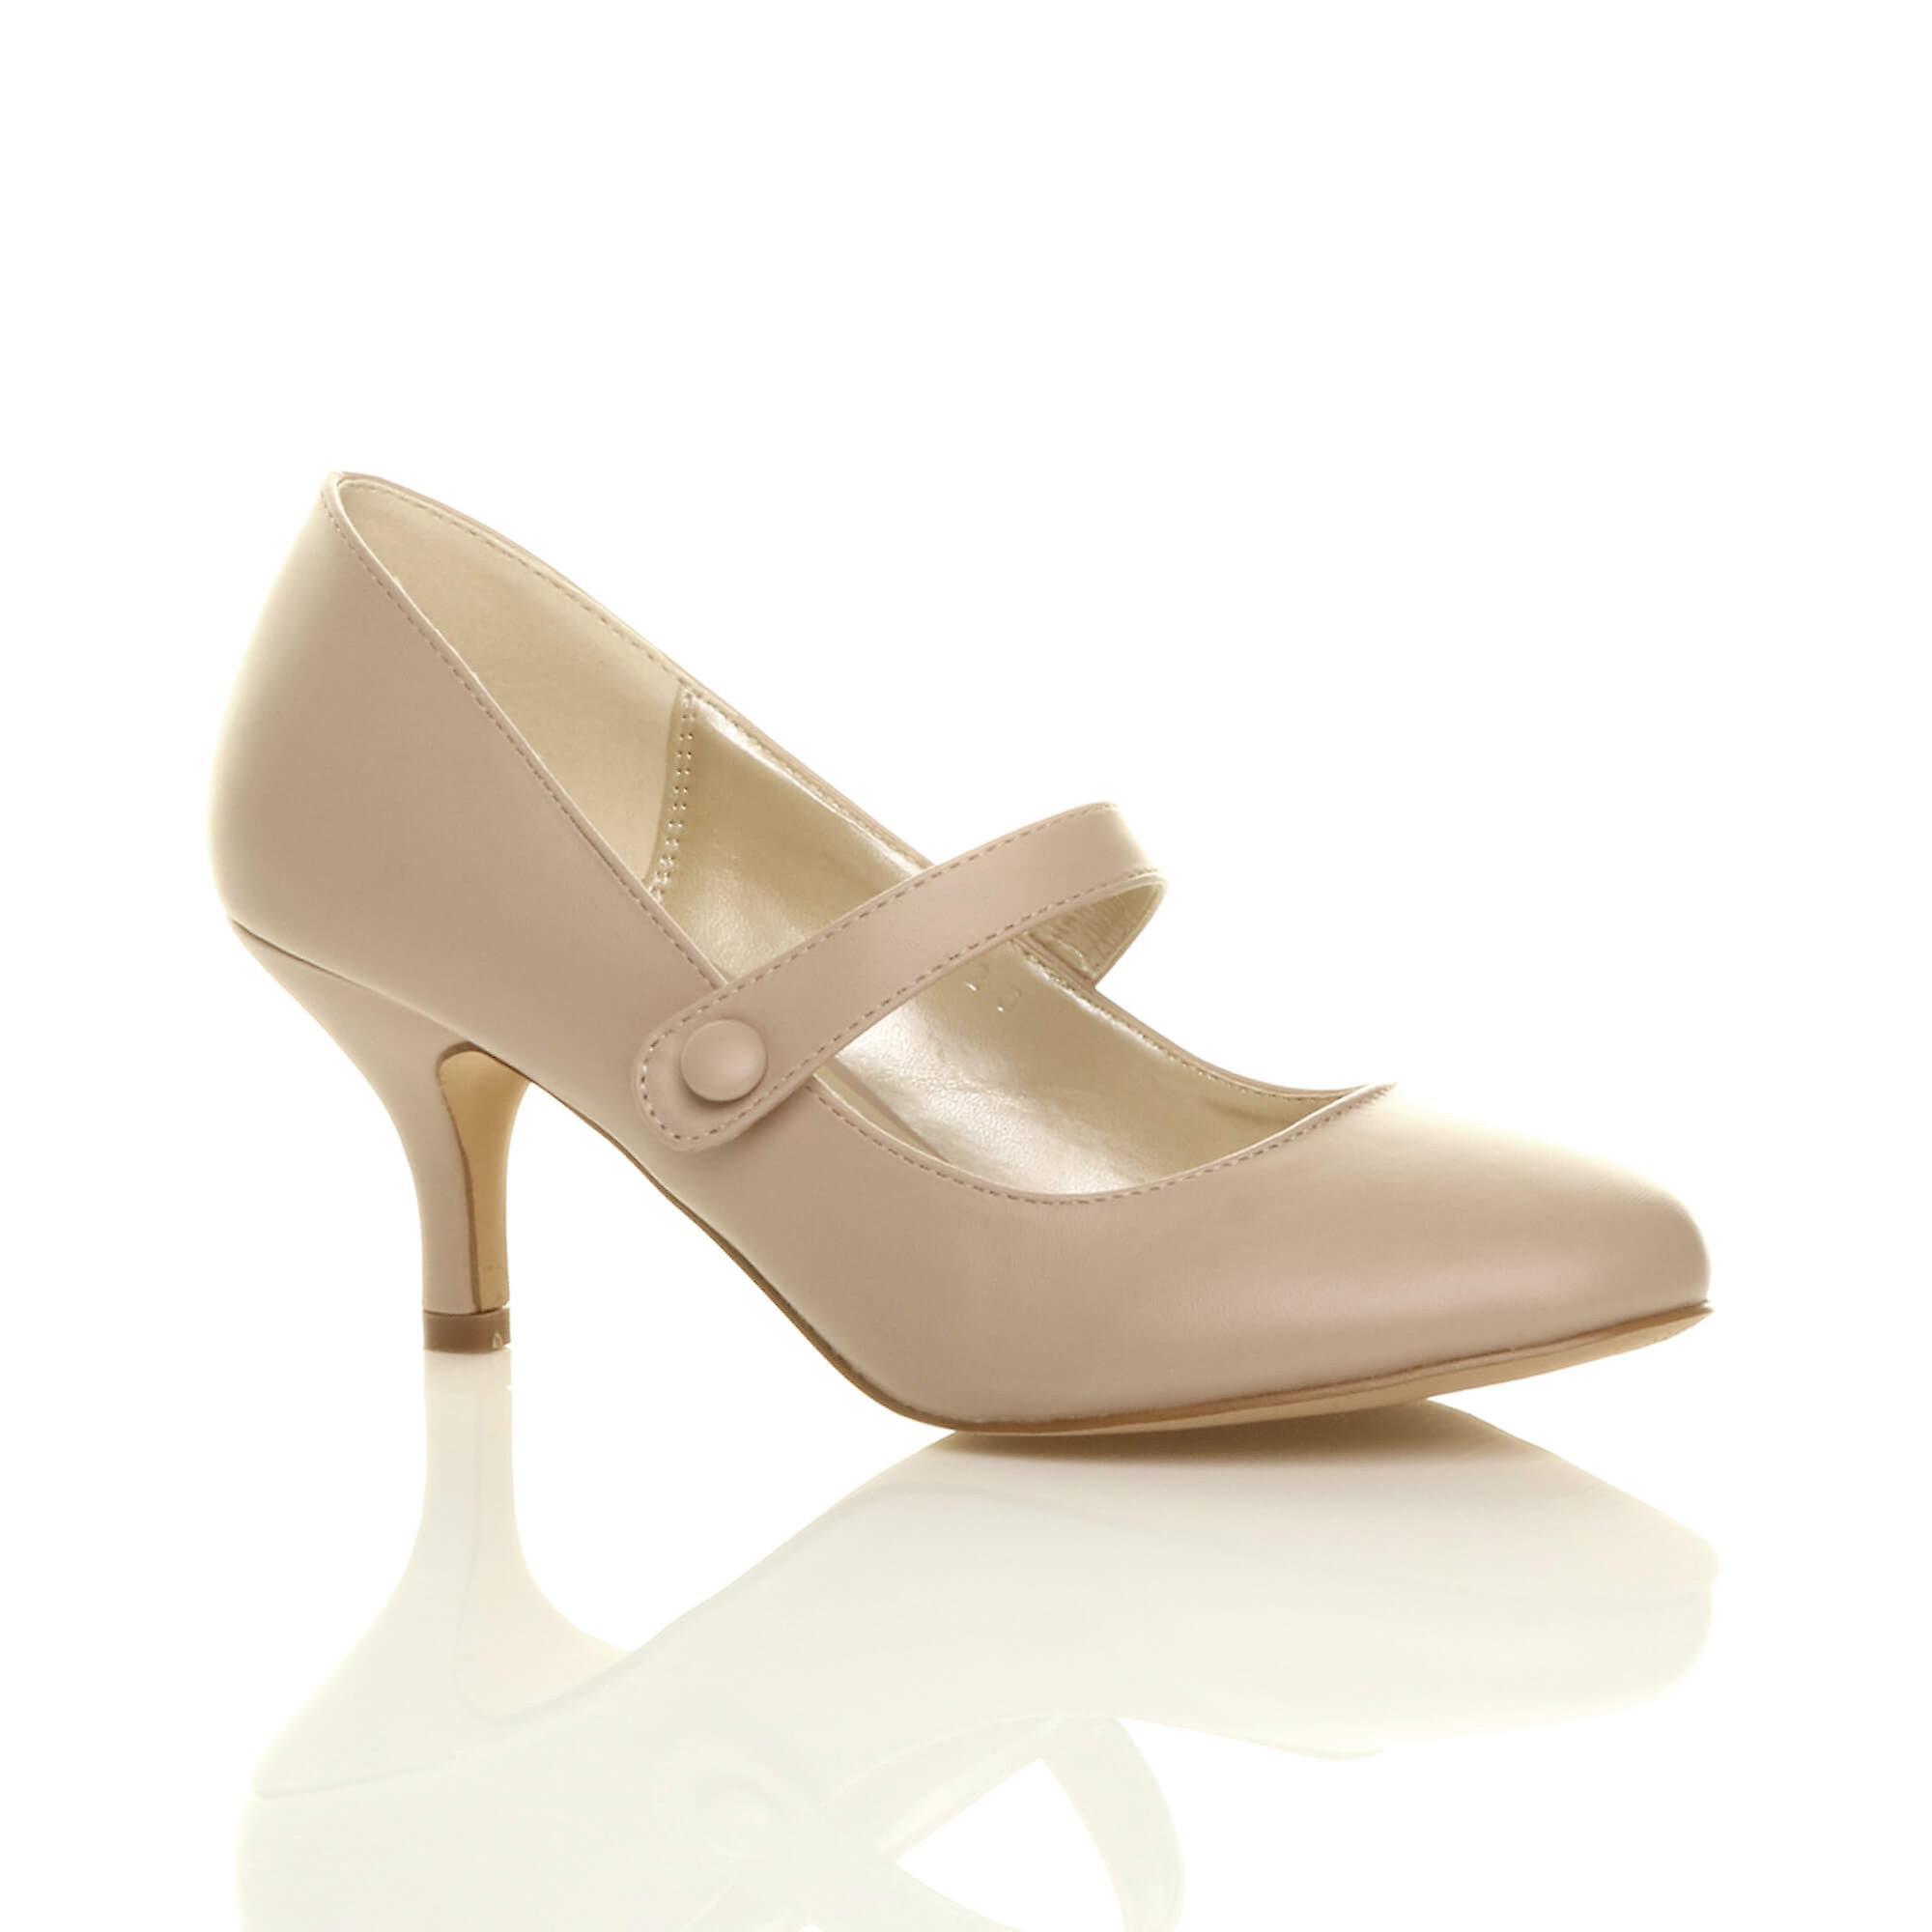 Ajvani womens low mid heel mary jane strap pumps-Huge work party court shoes pumps-Huge strap Cost-Men's/Women's f5e9cc